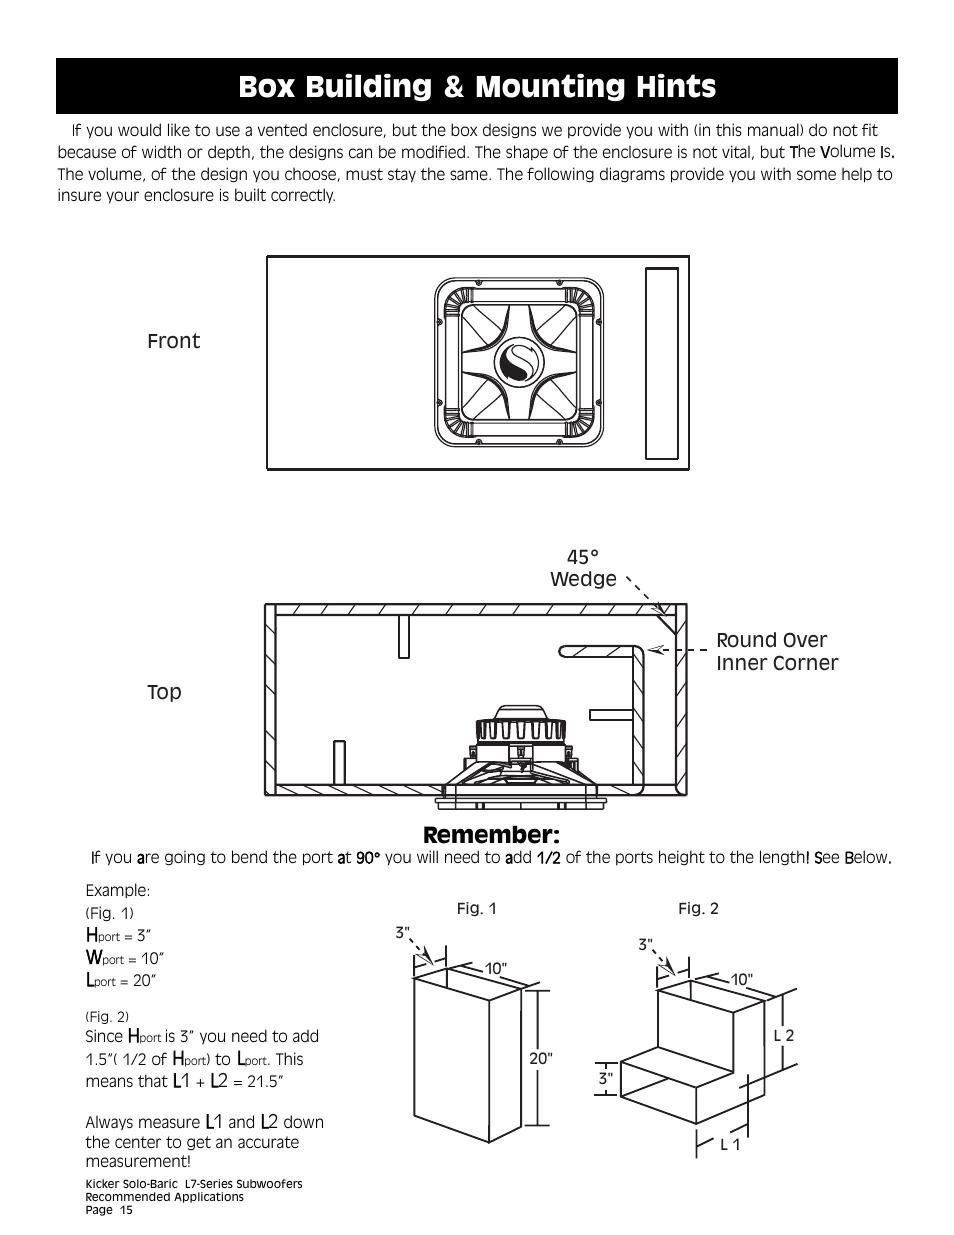 6673FA0 Kicker L7 15 Wiring Diagram | Wiring Resources on kicker comp 12 wiring diagram, kicker box diagrams, kicker comp vr 12, jl audio w3 wiring diagram, kicker cvx subwoofer diagram, kicker l7 12 wiring diagram, kicker cvr 2 ohm wiring to, audiobahn subwoofer wiring diagram, kicker l7 subs wiring-diagram, alpine type r 12 wiring diagram, kicker cvr 2 12 wiring, four kicker cvr 2 ohm subwoofer wiring diagram, kicker comp cvr wiring,